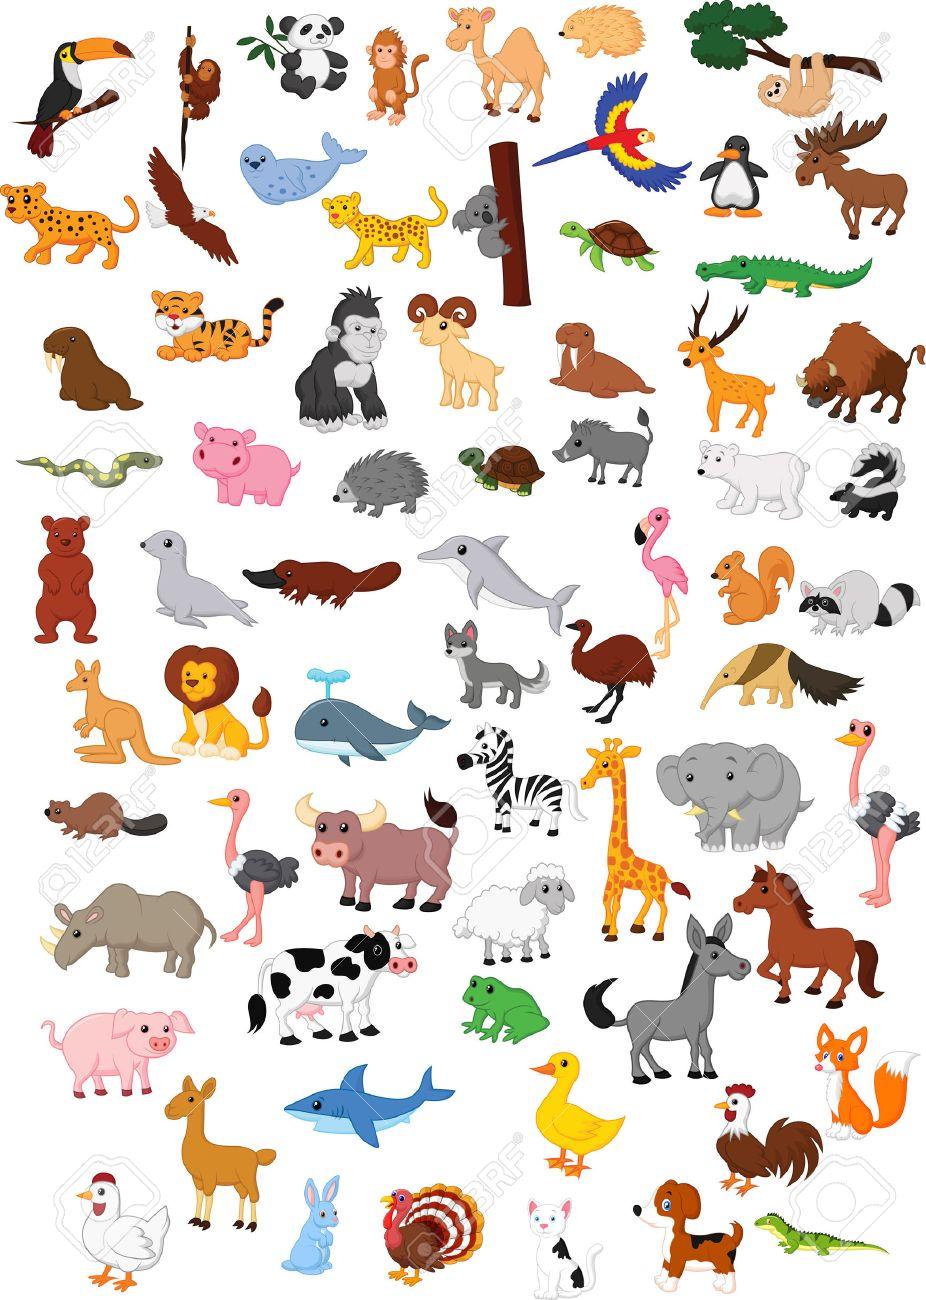 Big animal cartoon set - 27657376